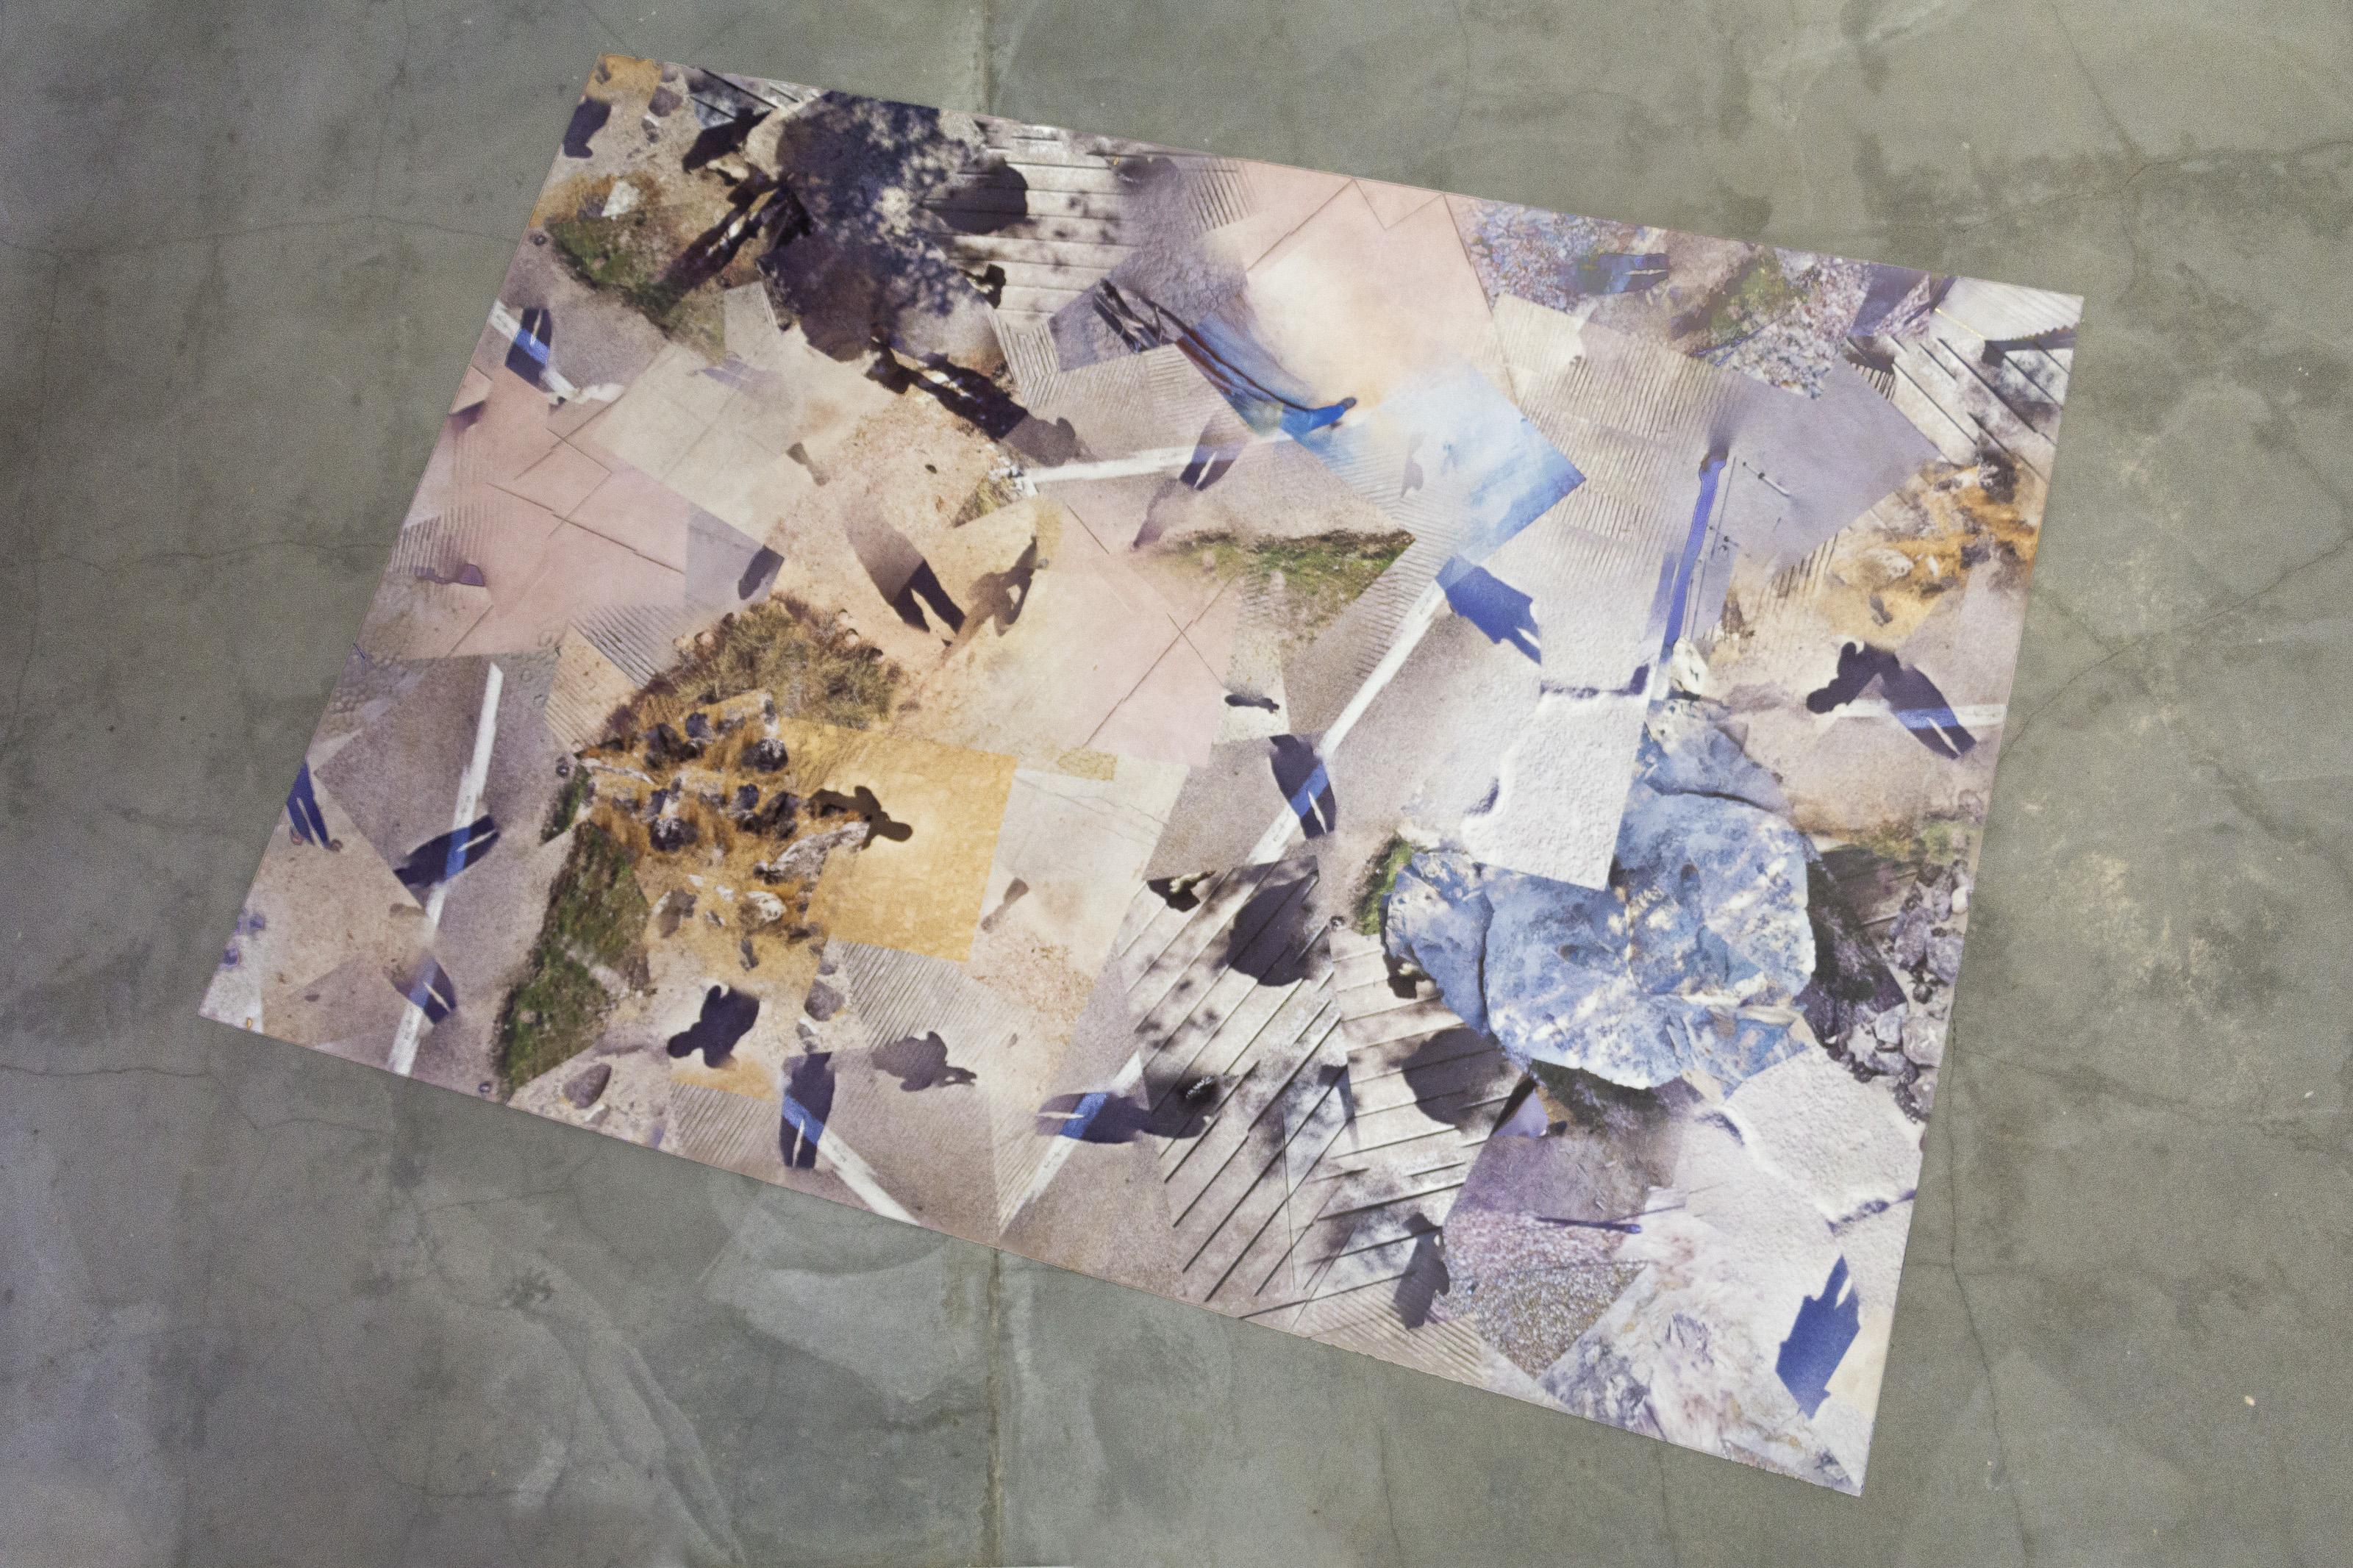 "Johanna Flato, ""The Trail Leads West"" installation view, Harlesden High Street, London 2019 (photo courtesy of Johanna Flato)"